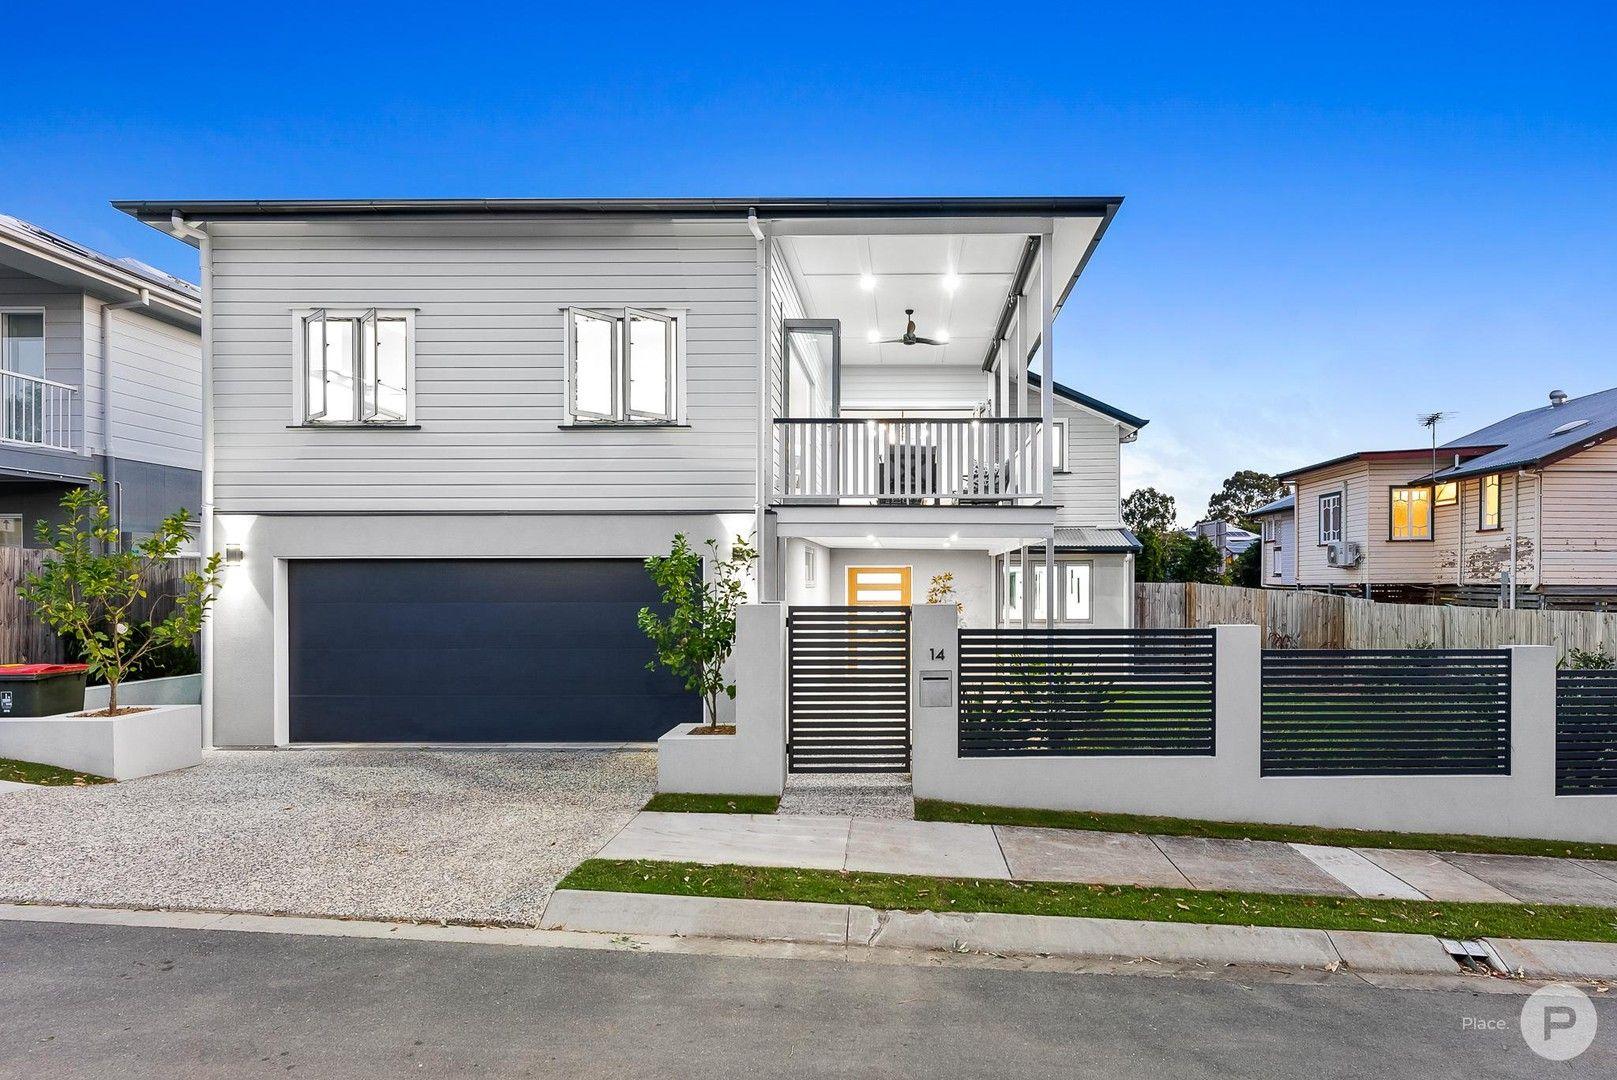 14 Brevis Lane, Enoggera QLD 4051, Image 0